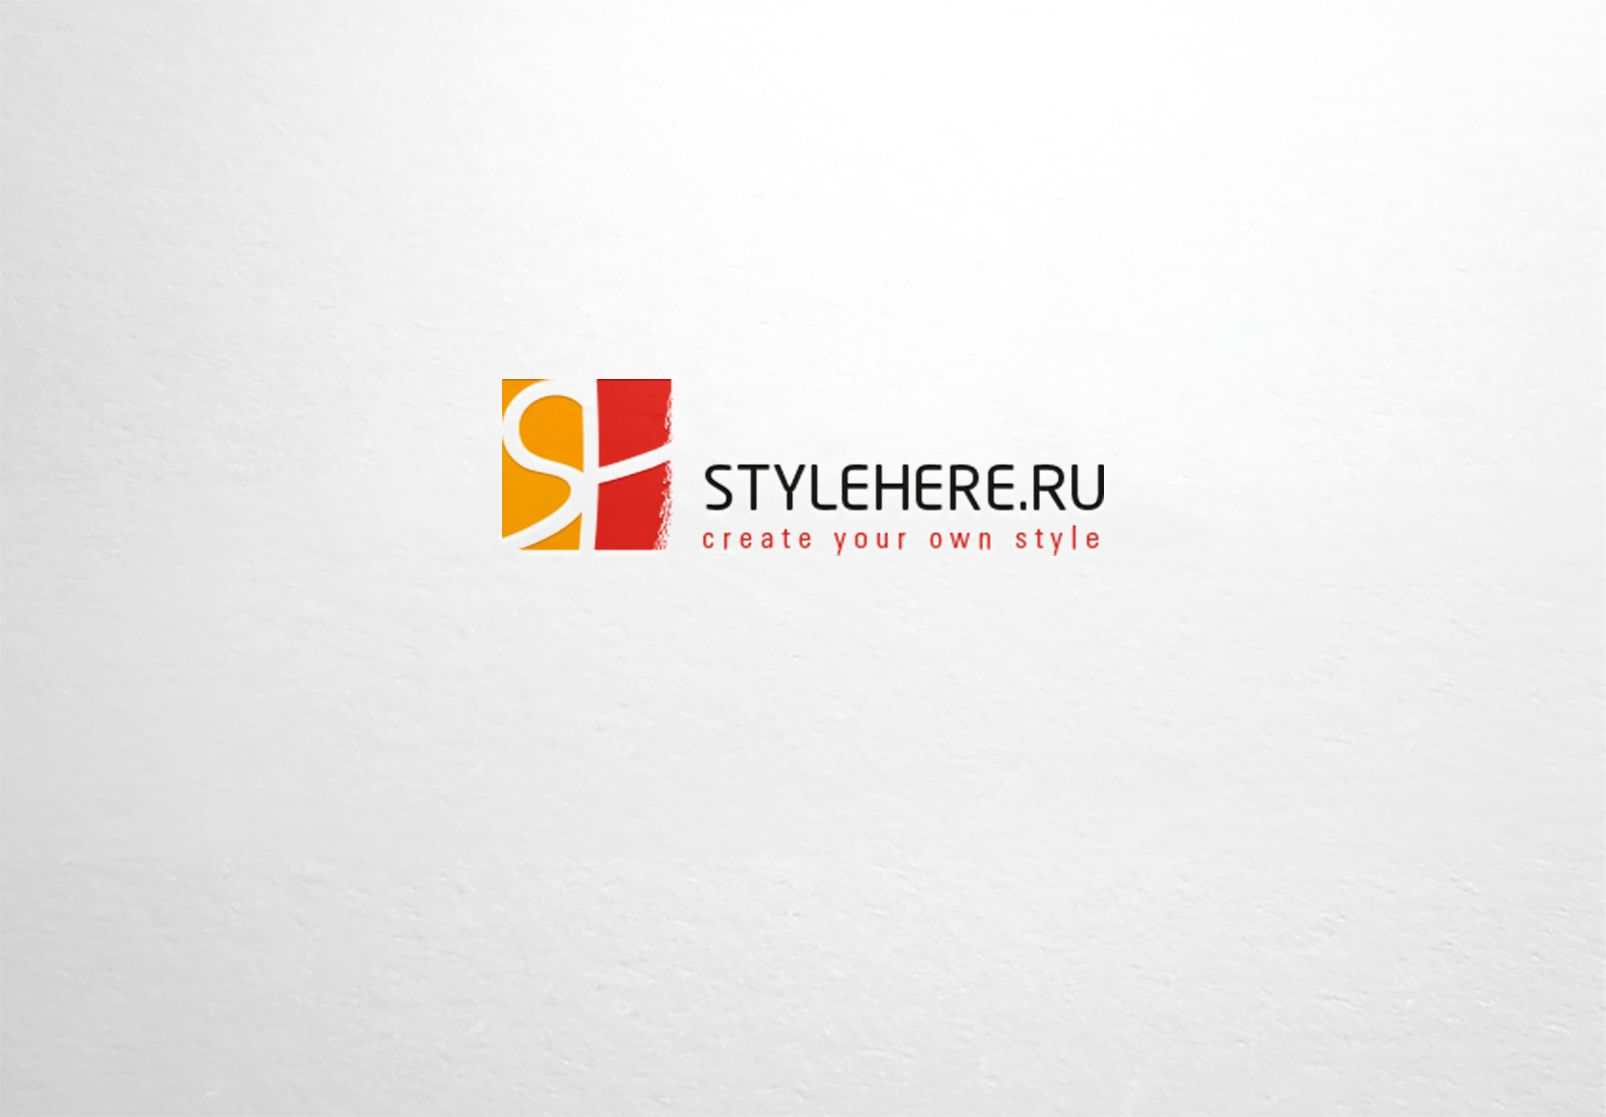 Логотип для интернет-магазина stylehere.ru - дизайнер dron55